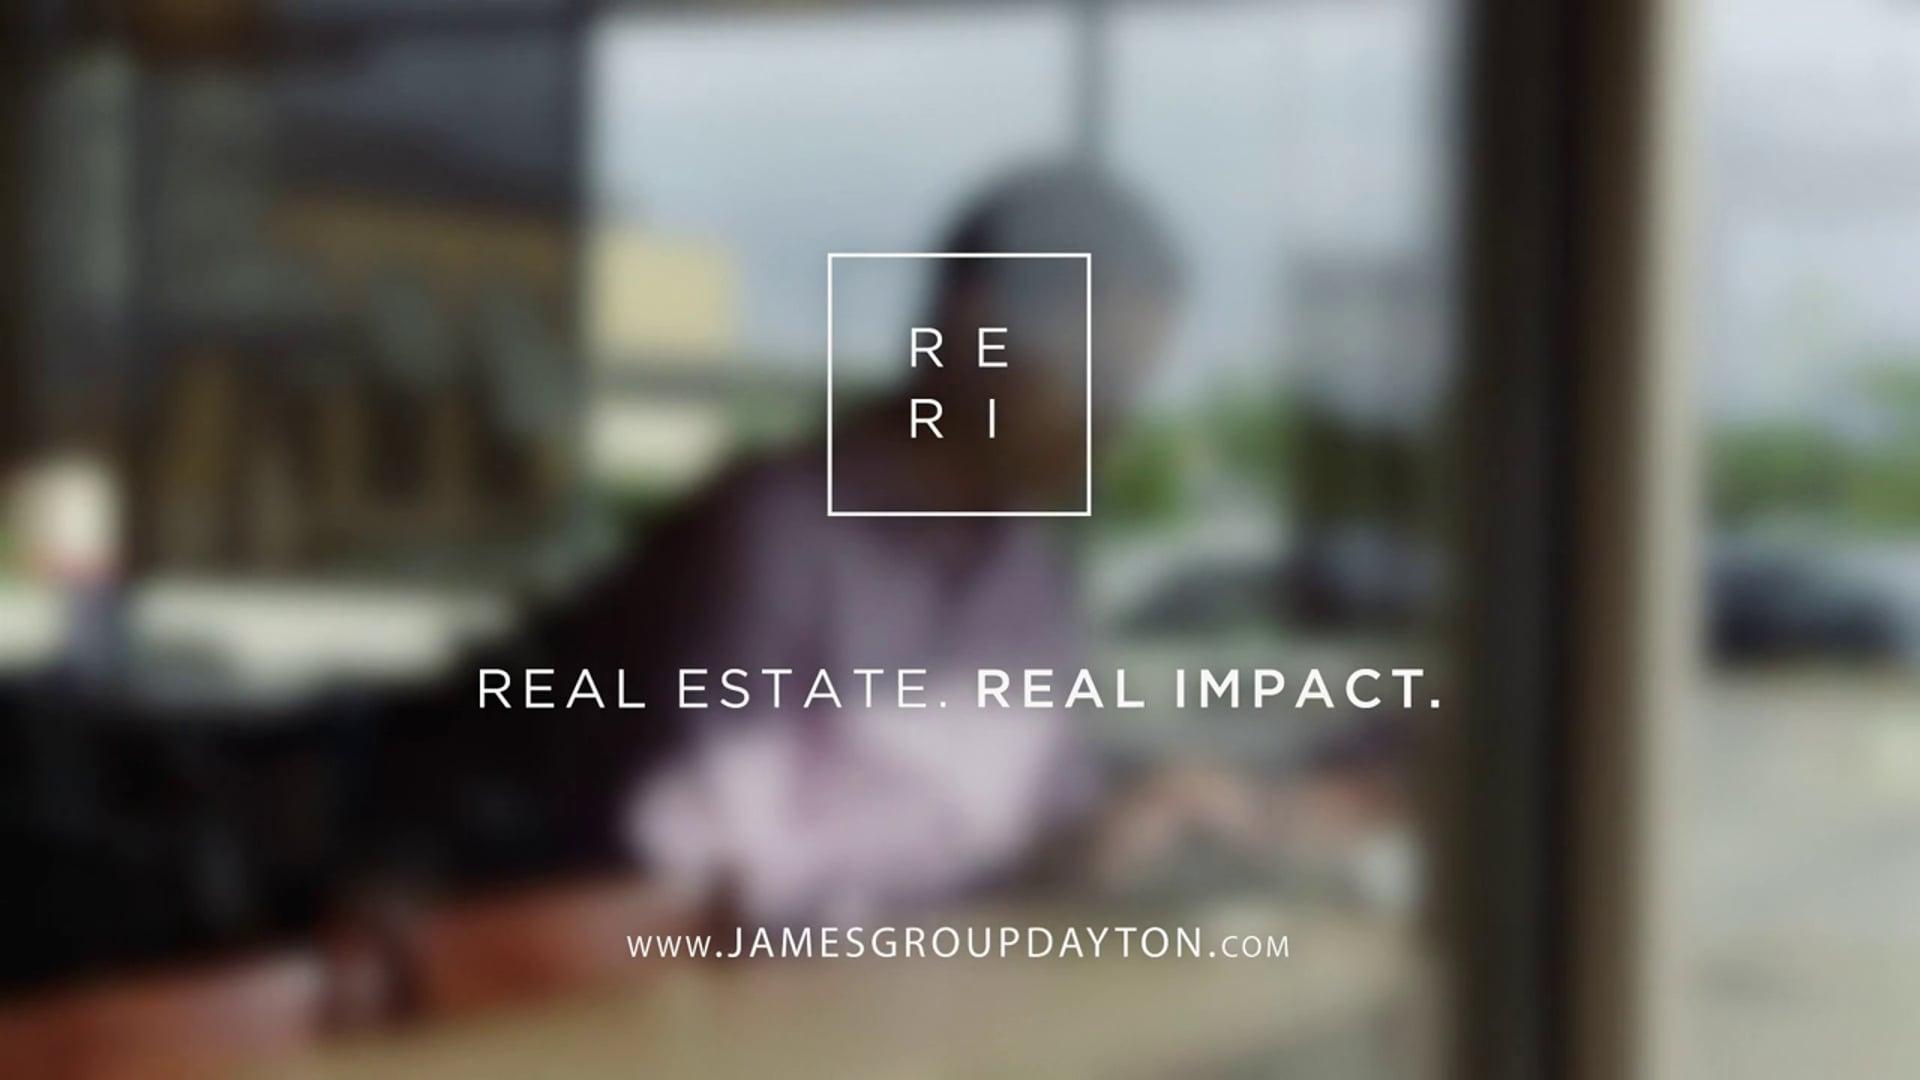 Real Estate. Real Impact.